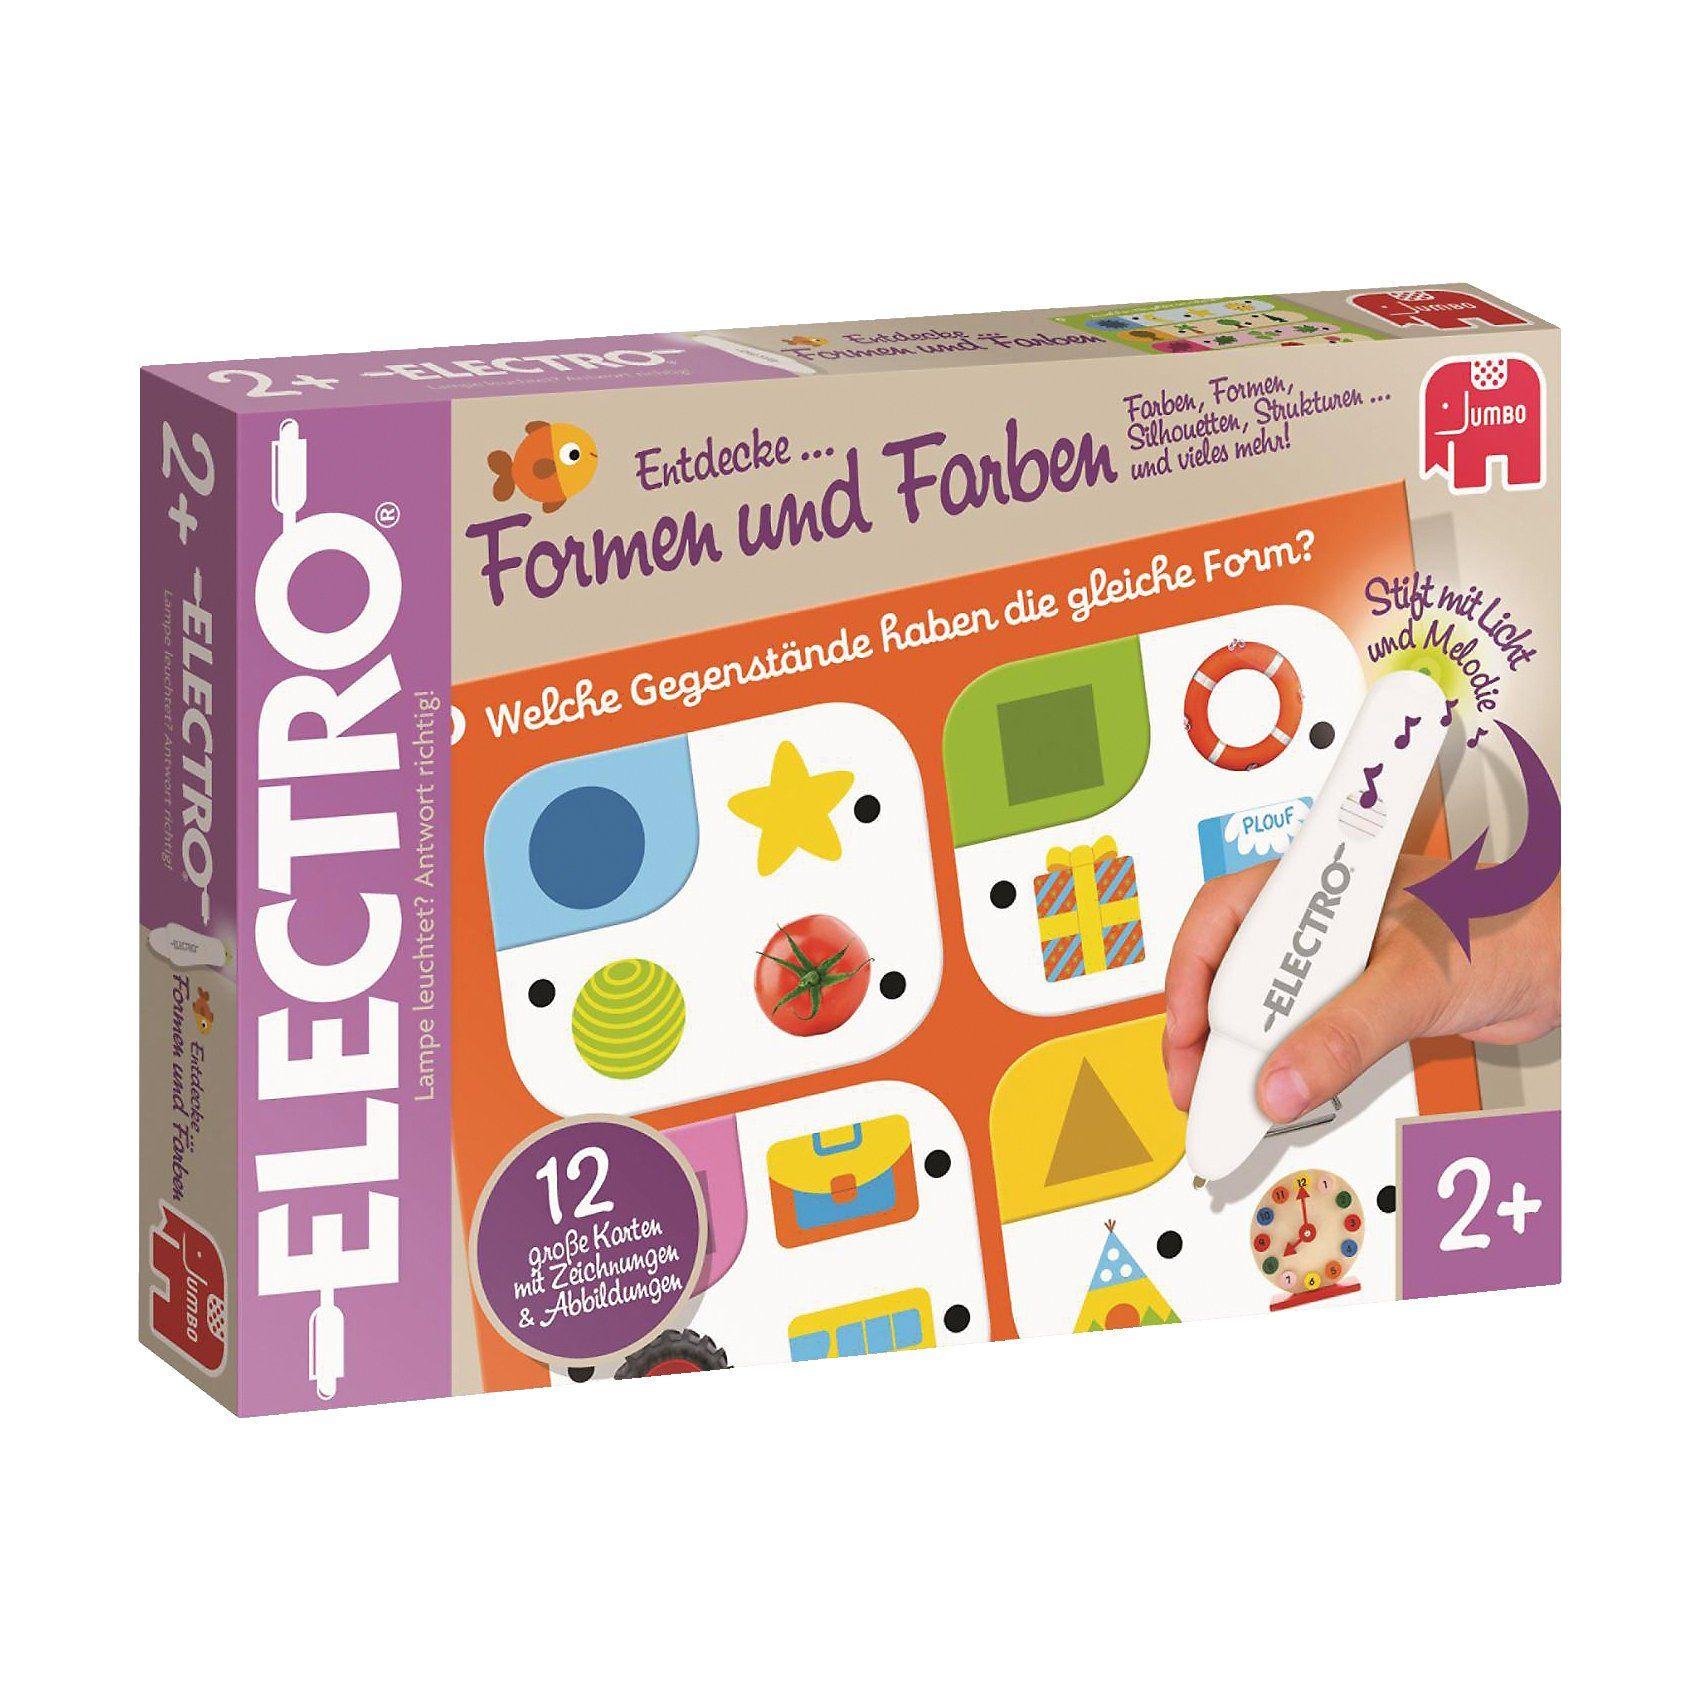 Jumbo Electro - Entdecke Formen & Farben